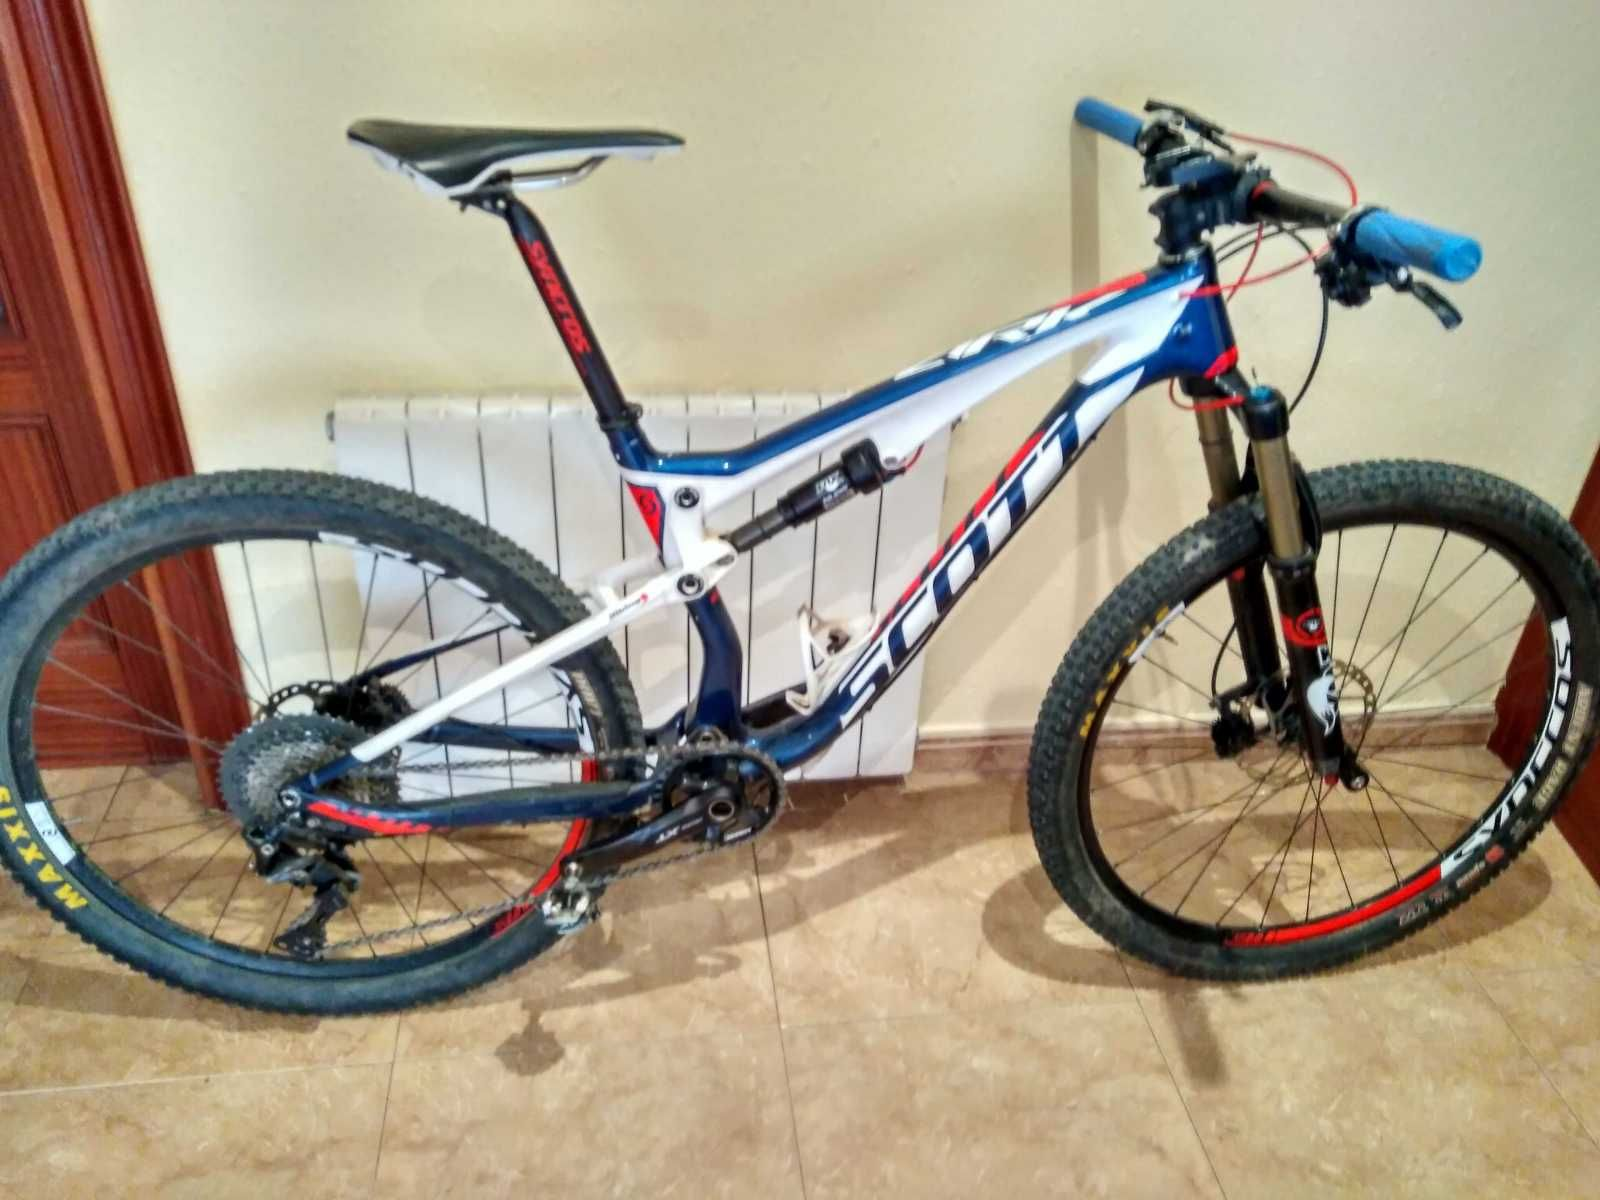 Bicicleta De Montaña Scott Spark 710 Ref 33785 Talla M Año 2015 Cambio Shimano Deore Xt Cuadro De Ca Bicicletas Bicicleta De Montaña Scott Bicicletas Mtb